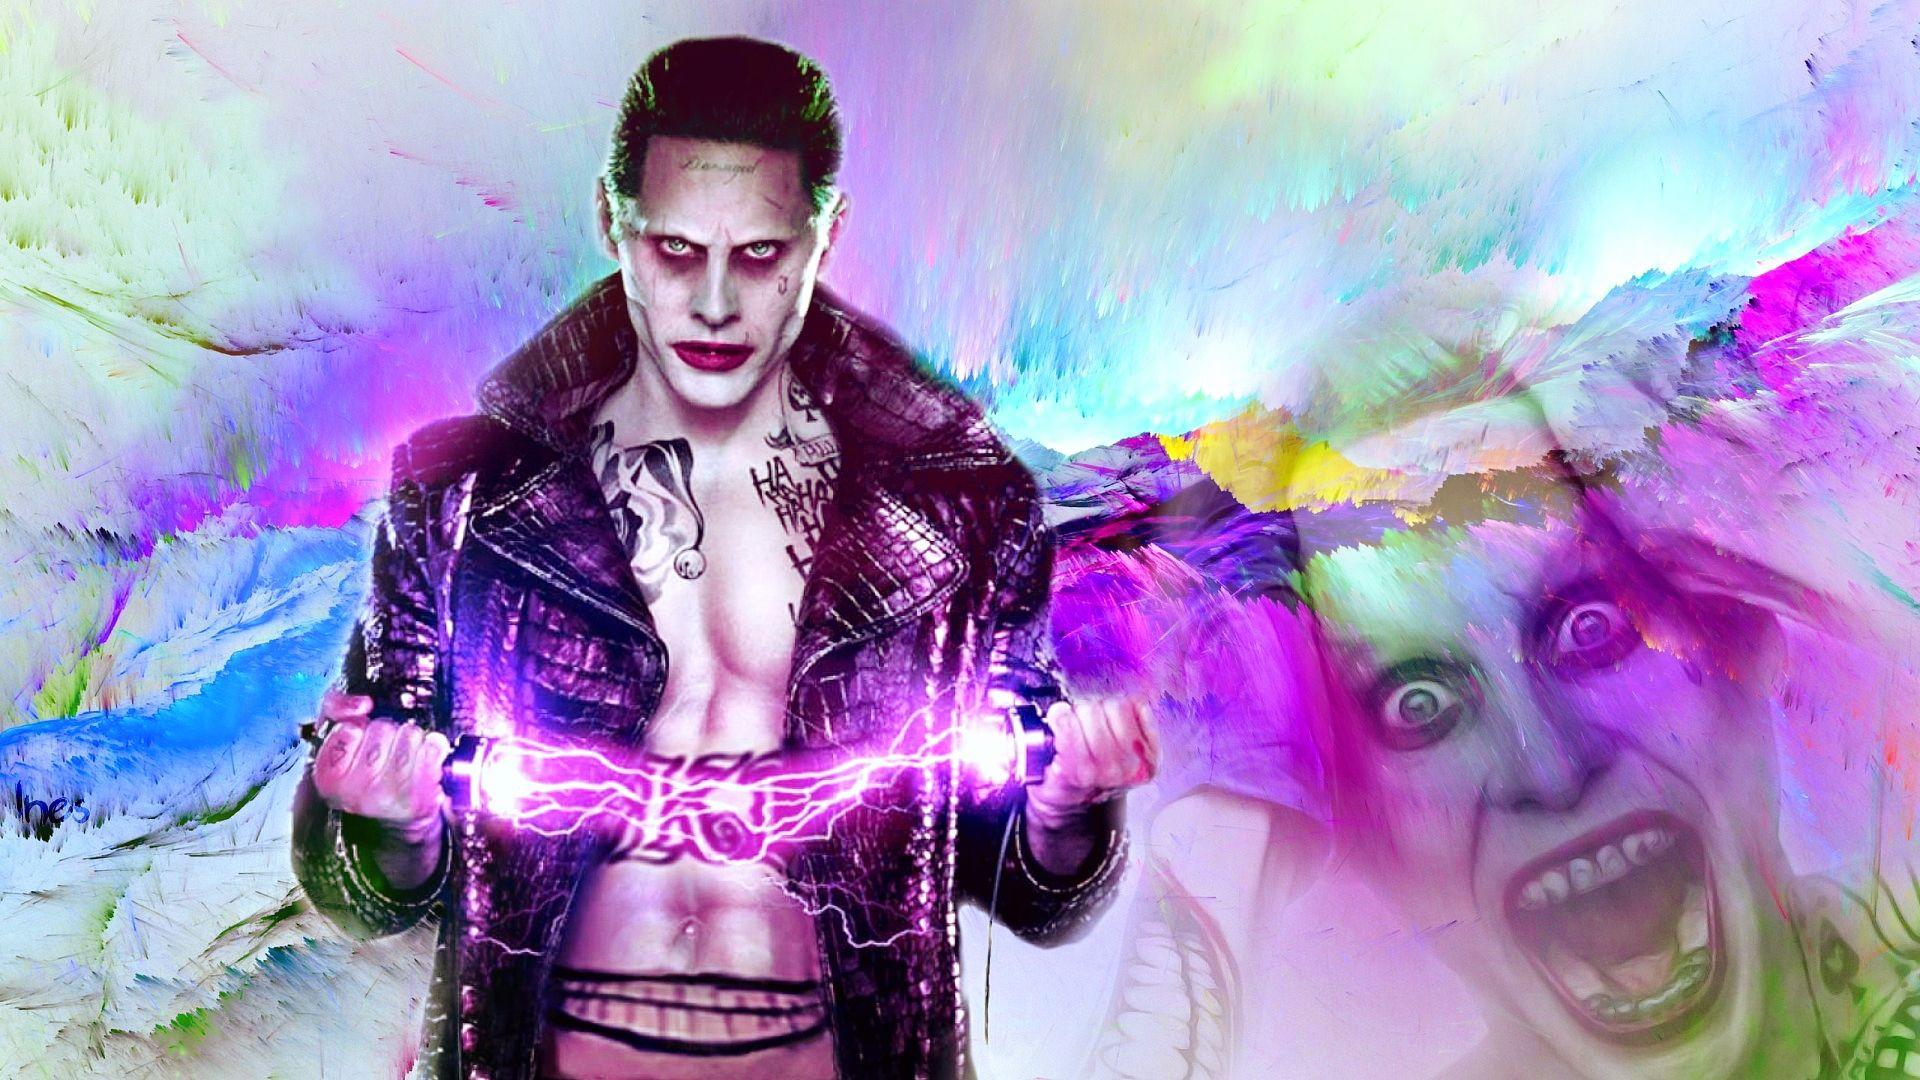 Suicide Squad Joker, Background Wallpaper